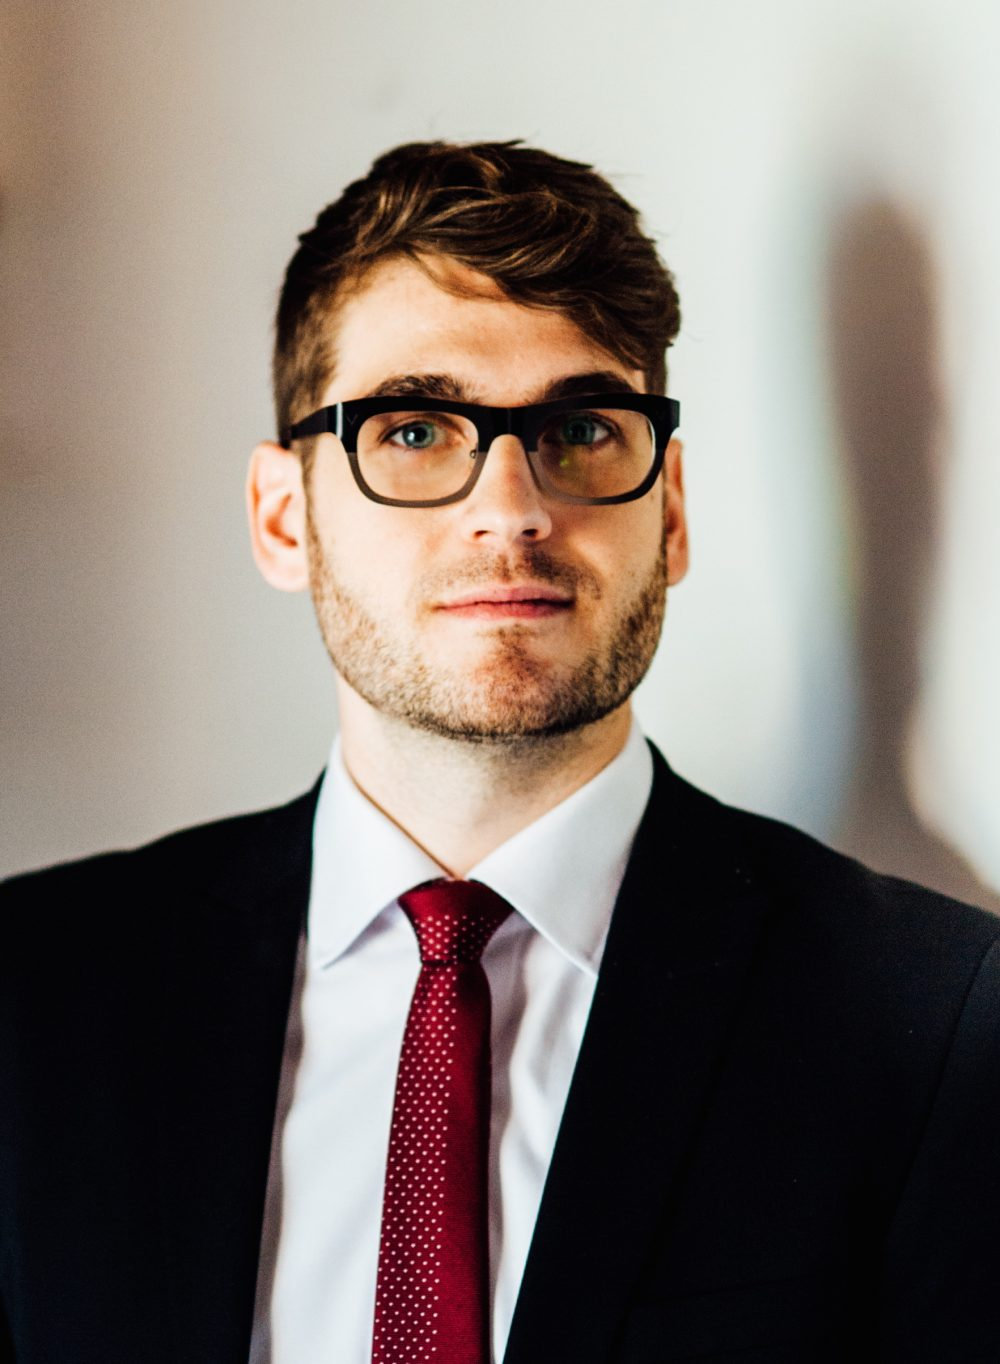 NEXT GEN: Tech-savvy optometrist Dr. Patrick Sauvageau